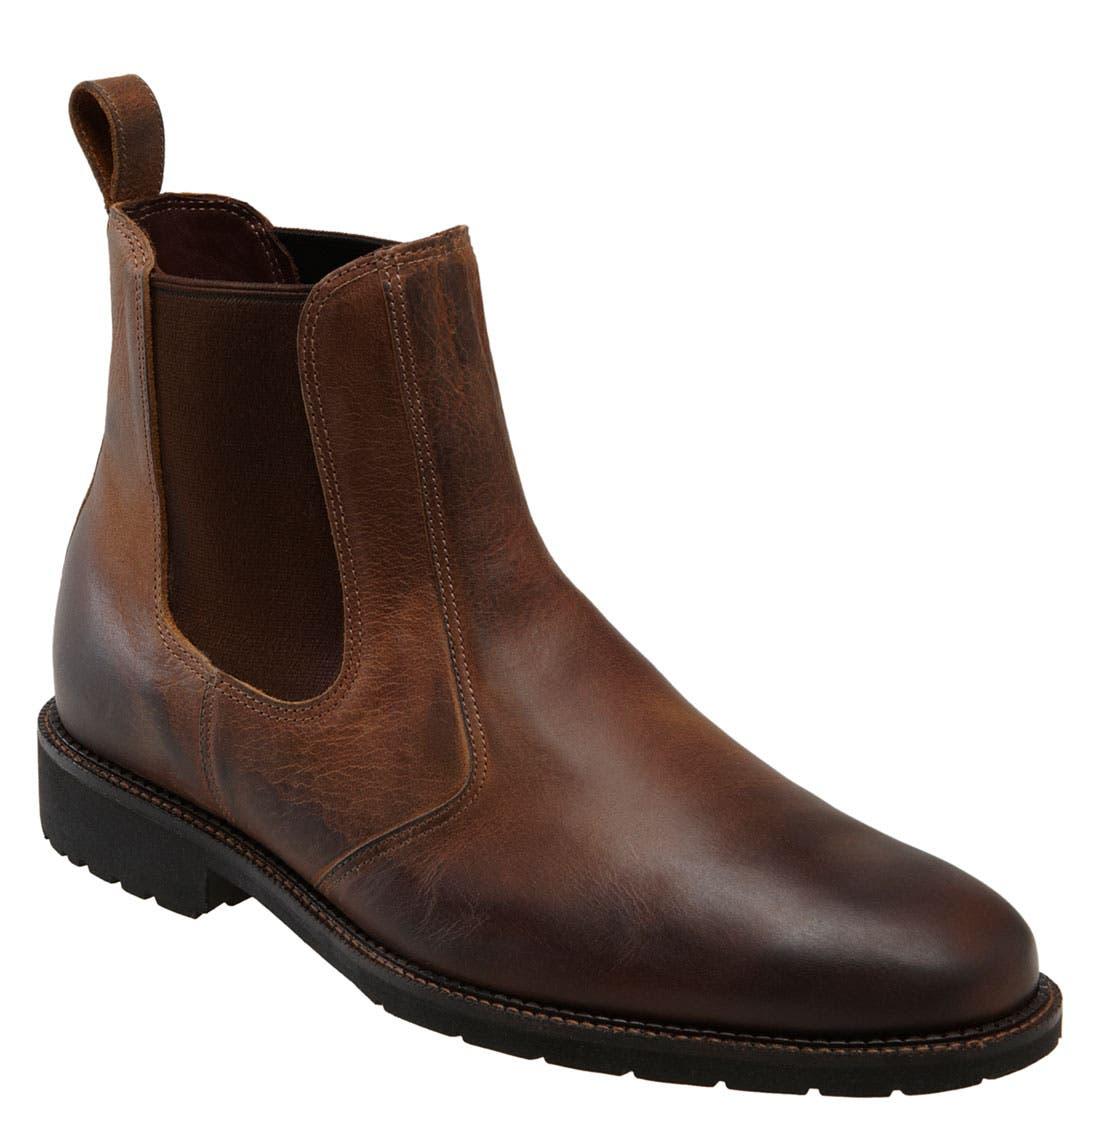 NEIL M 'Portland' Boot